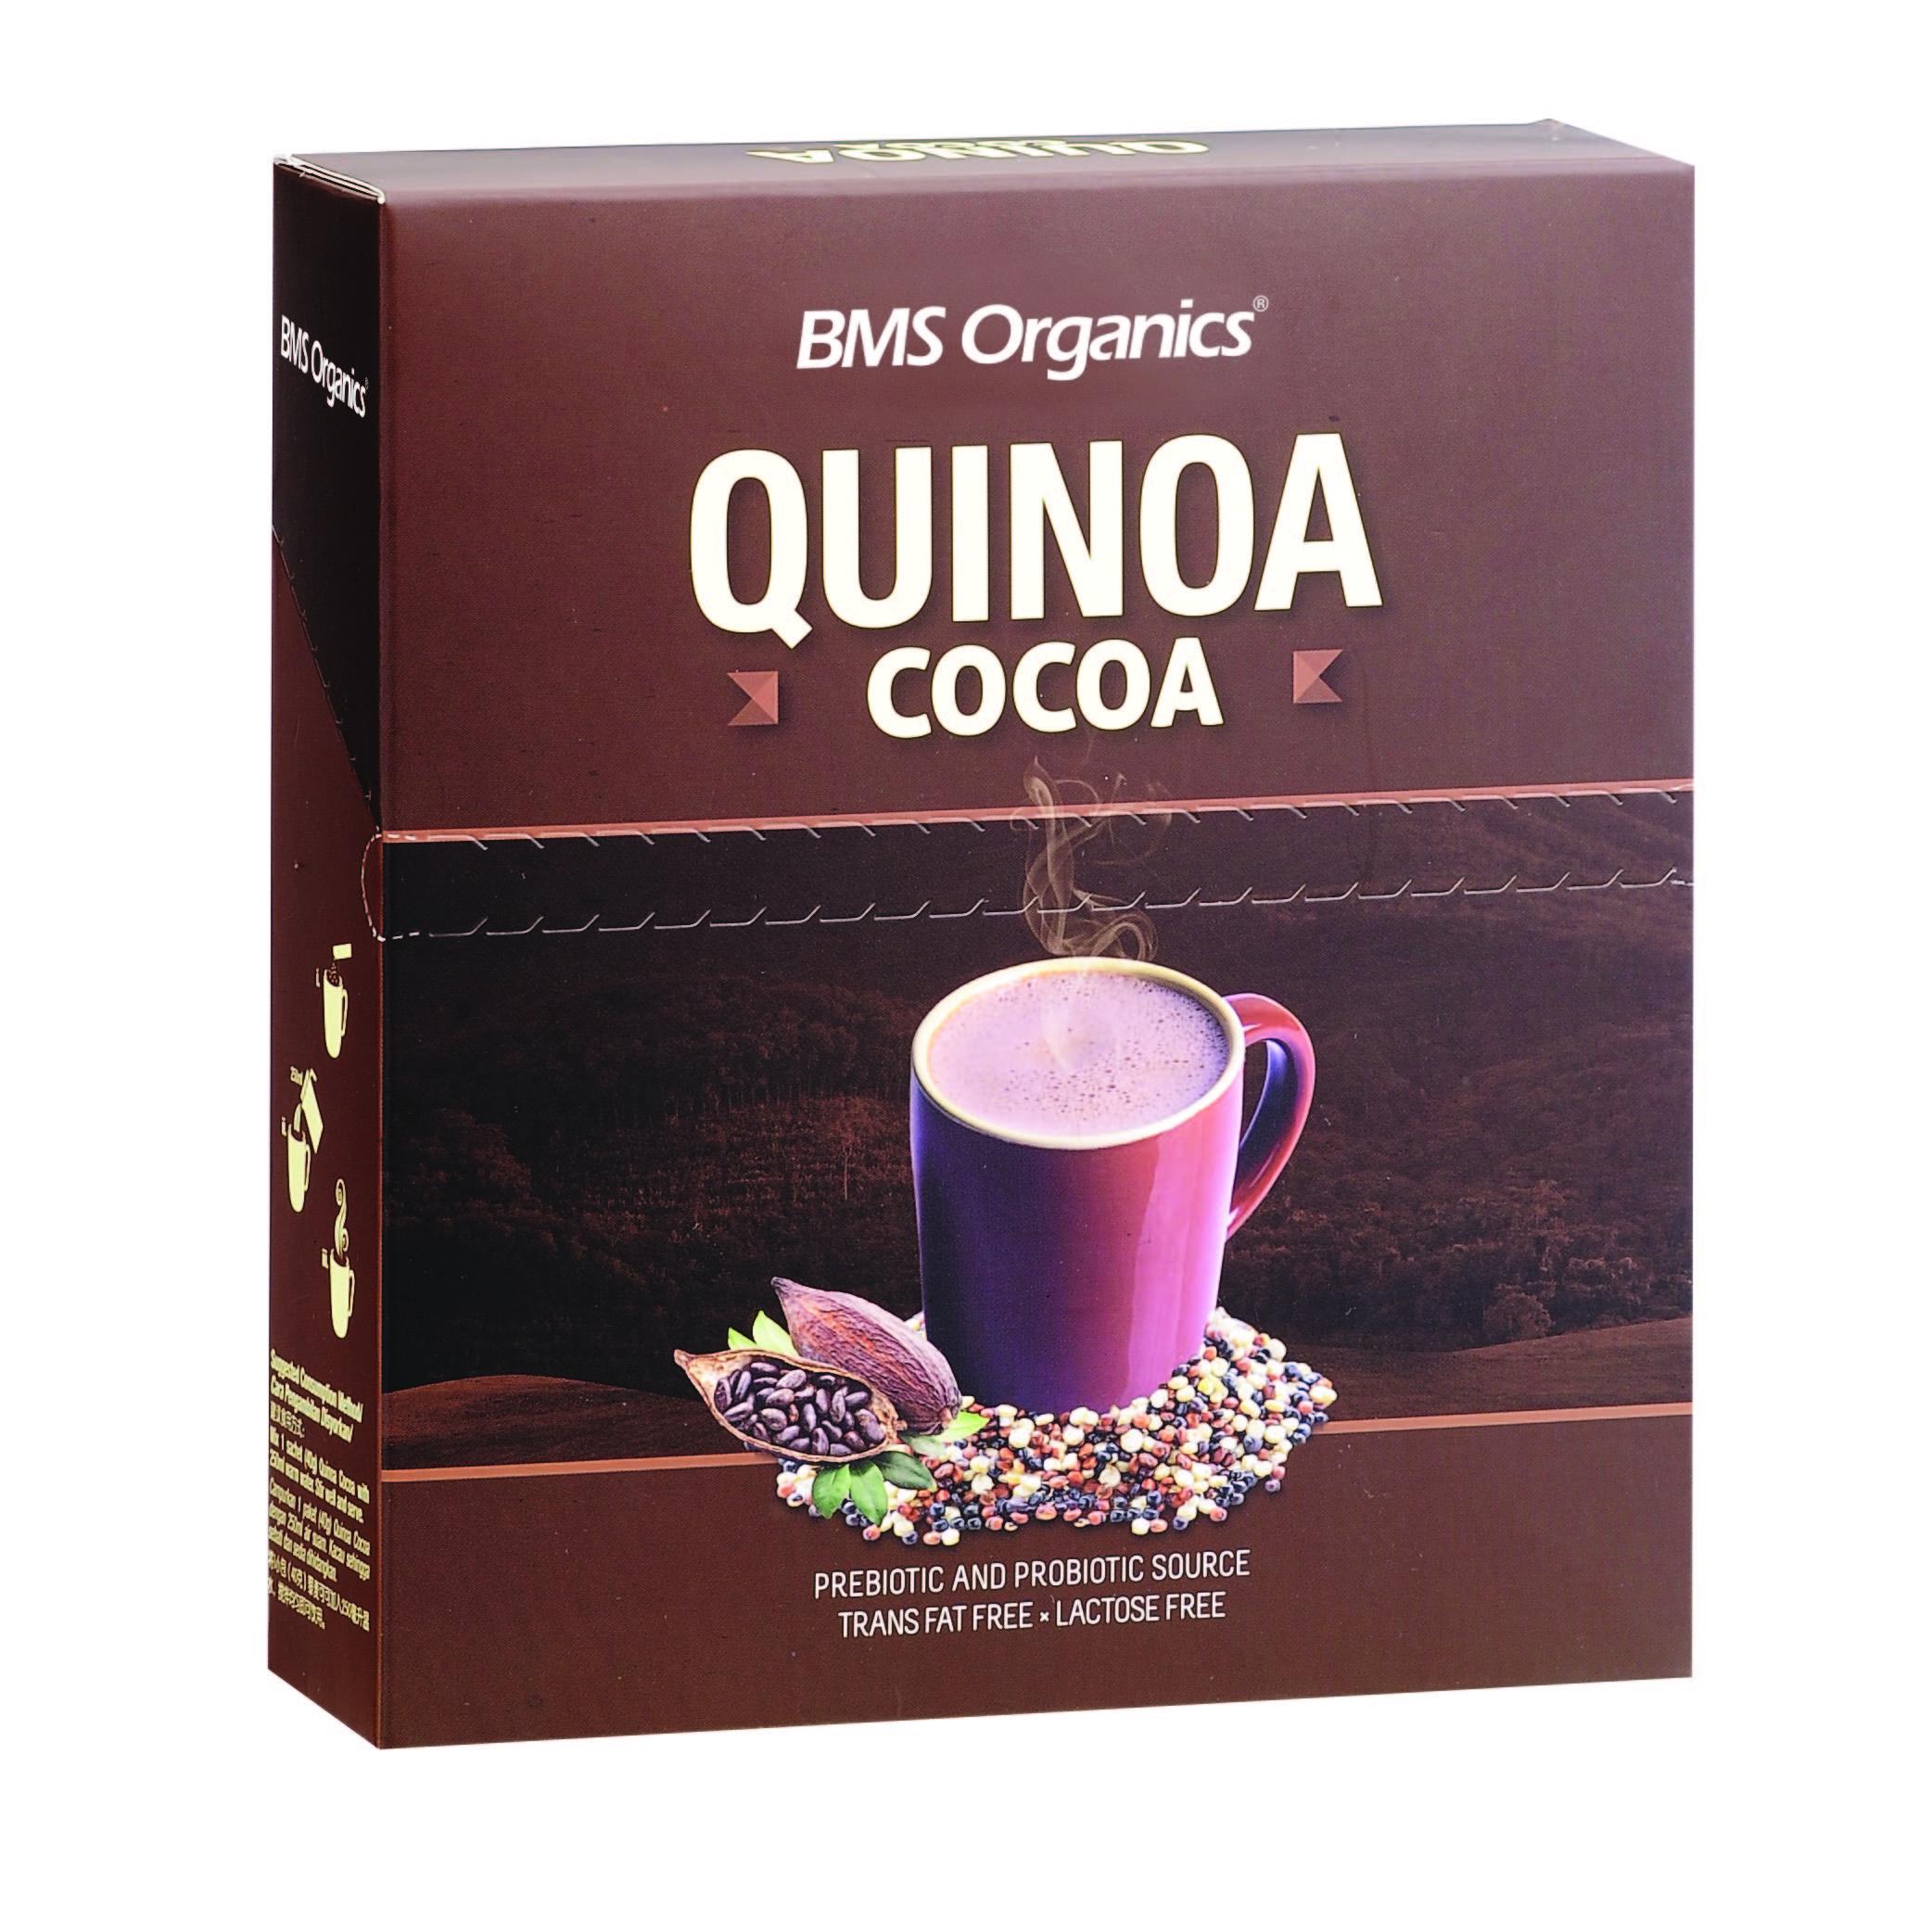 BMS Organics Quinoa Cocoa (40g x 10 sachets)